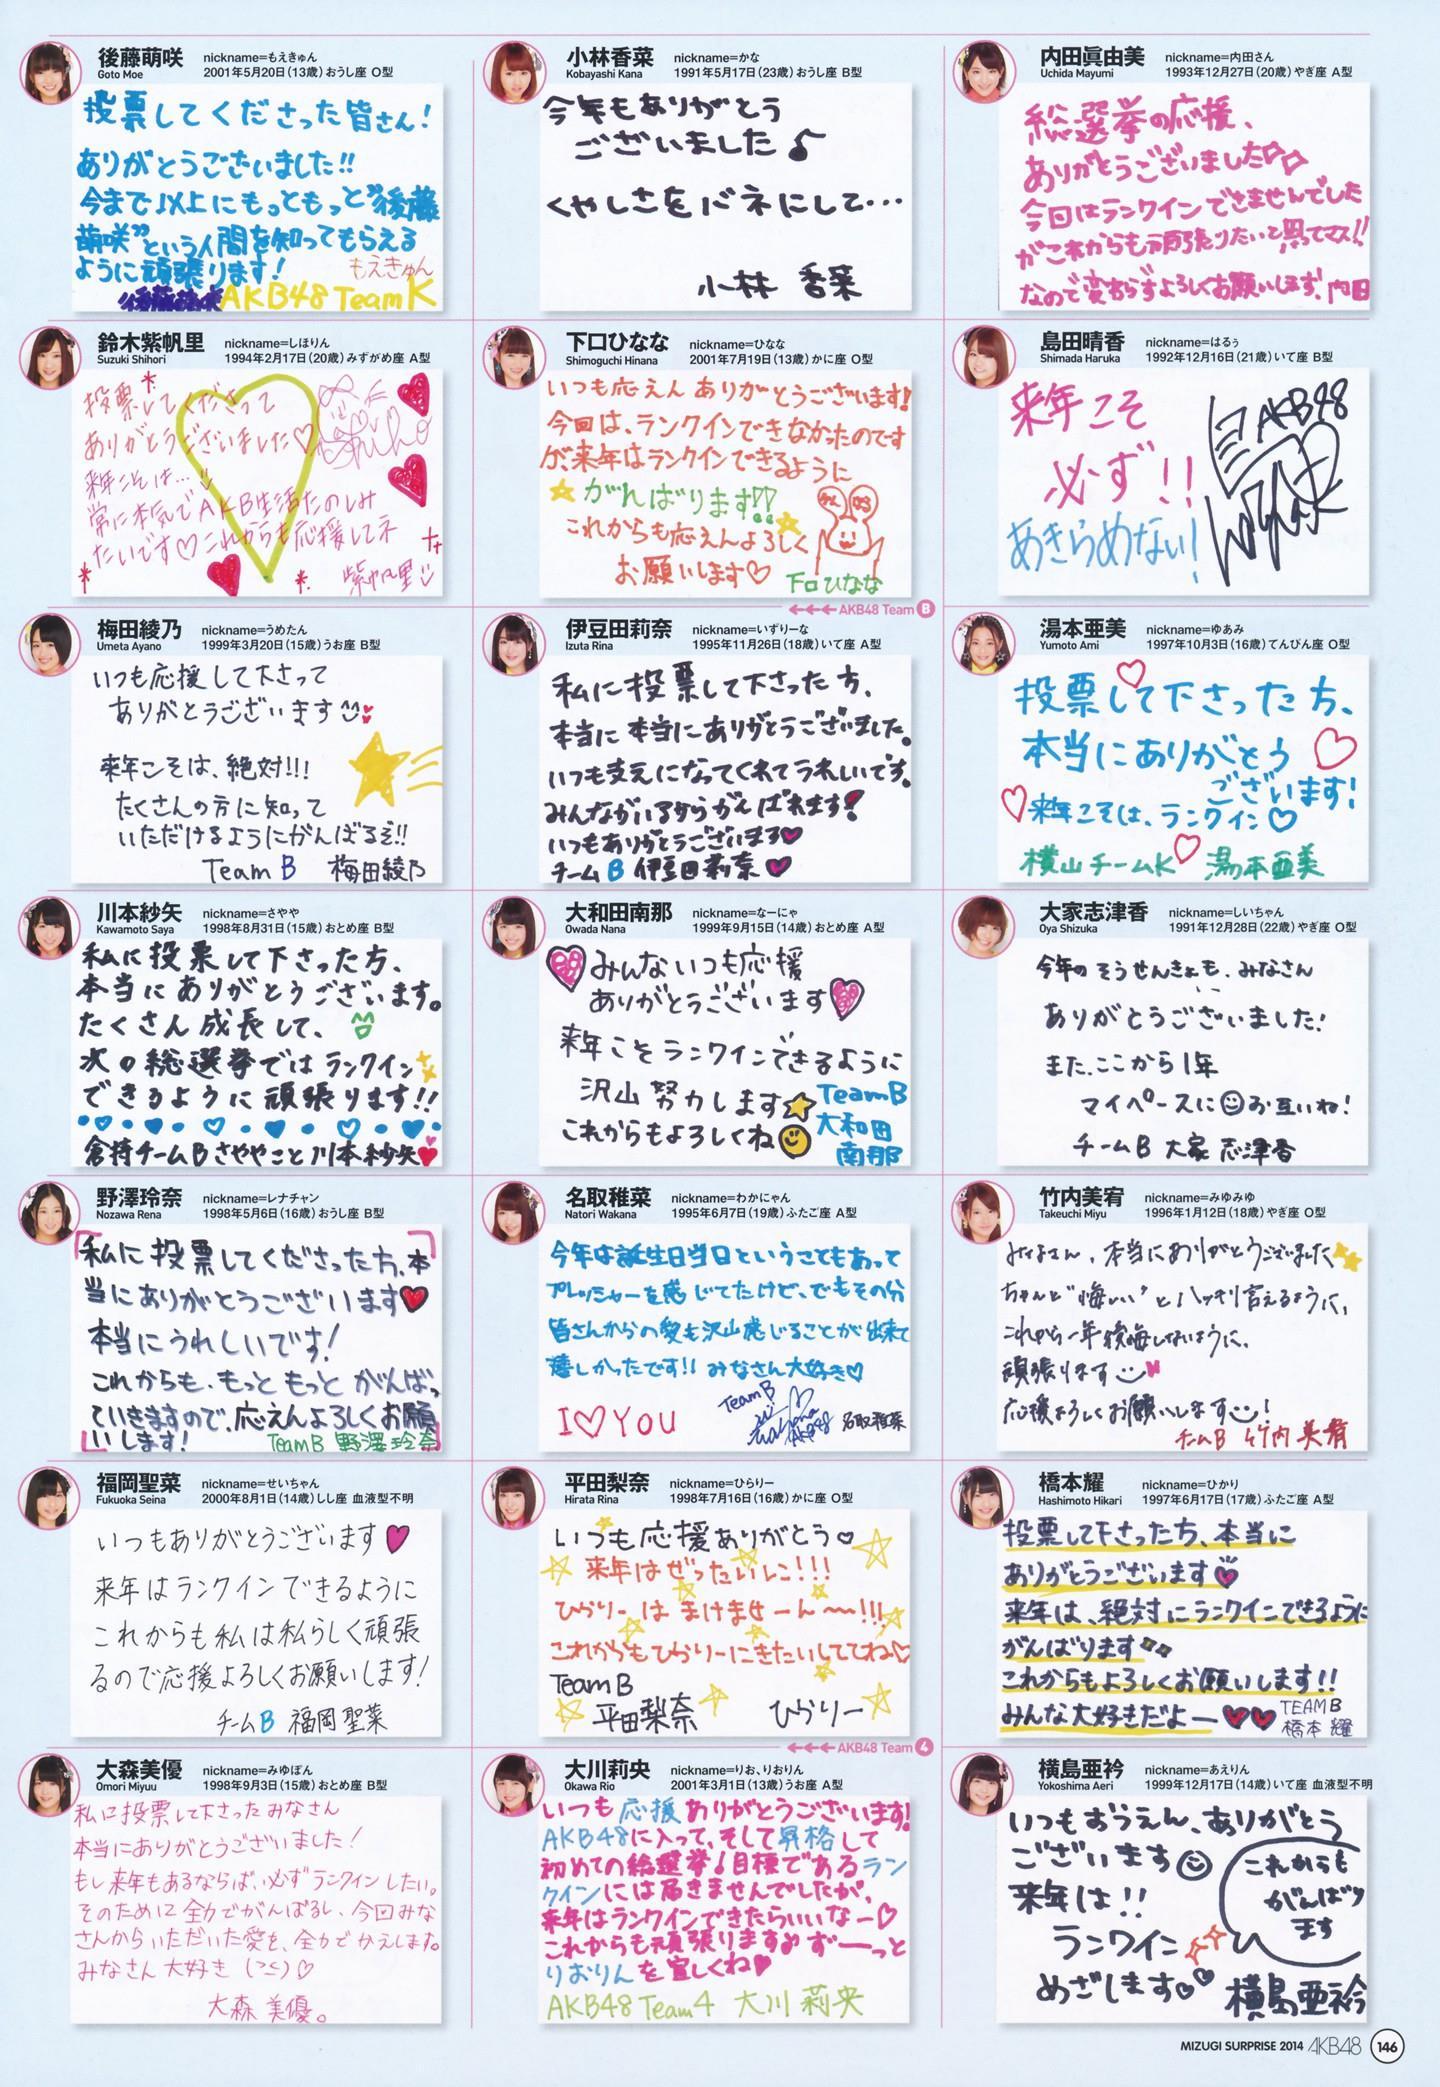 AKB48人気メンバー 画像 133